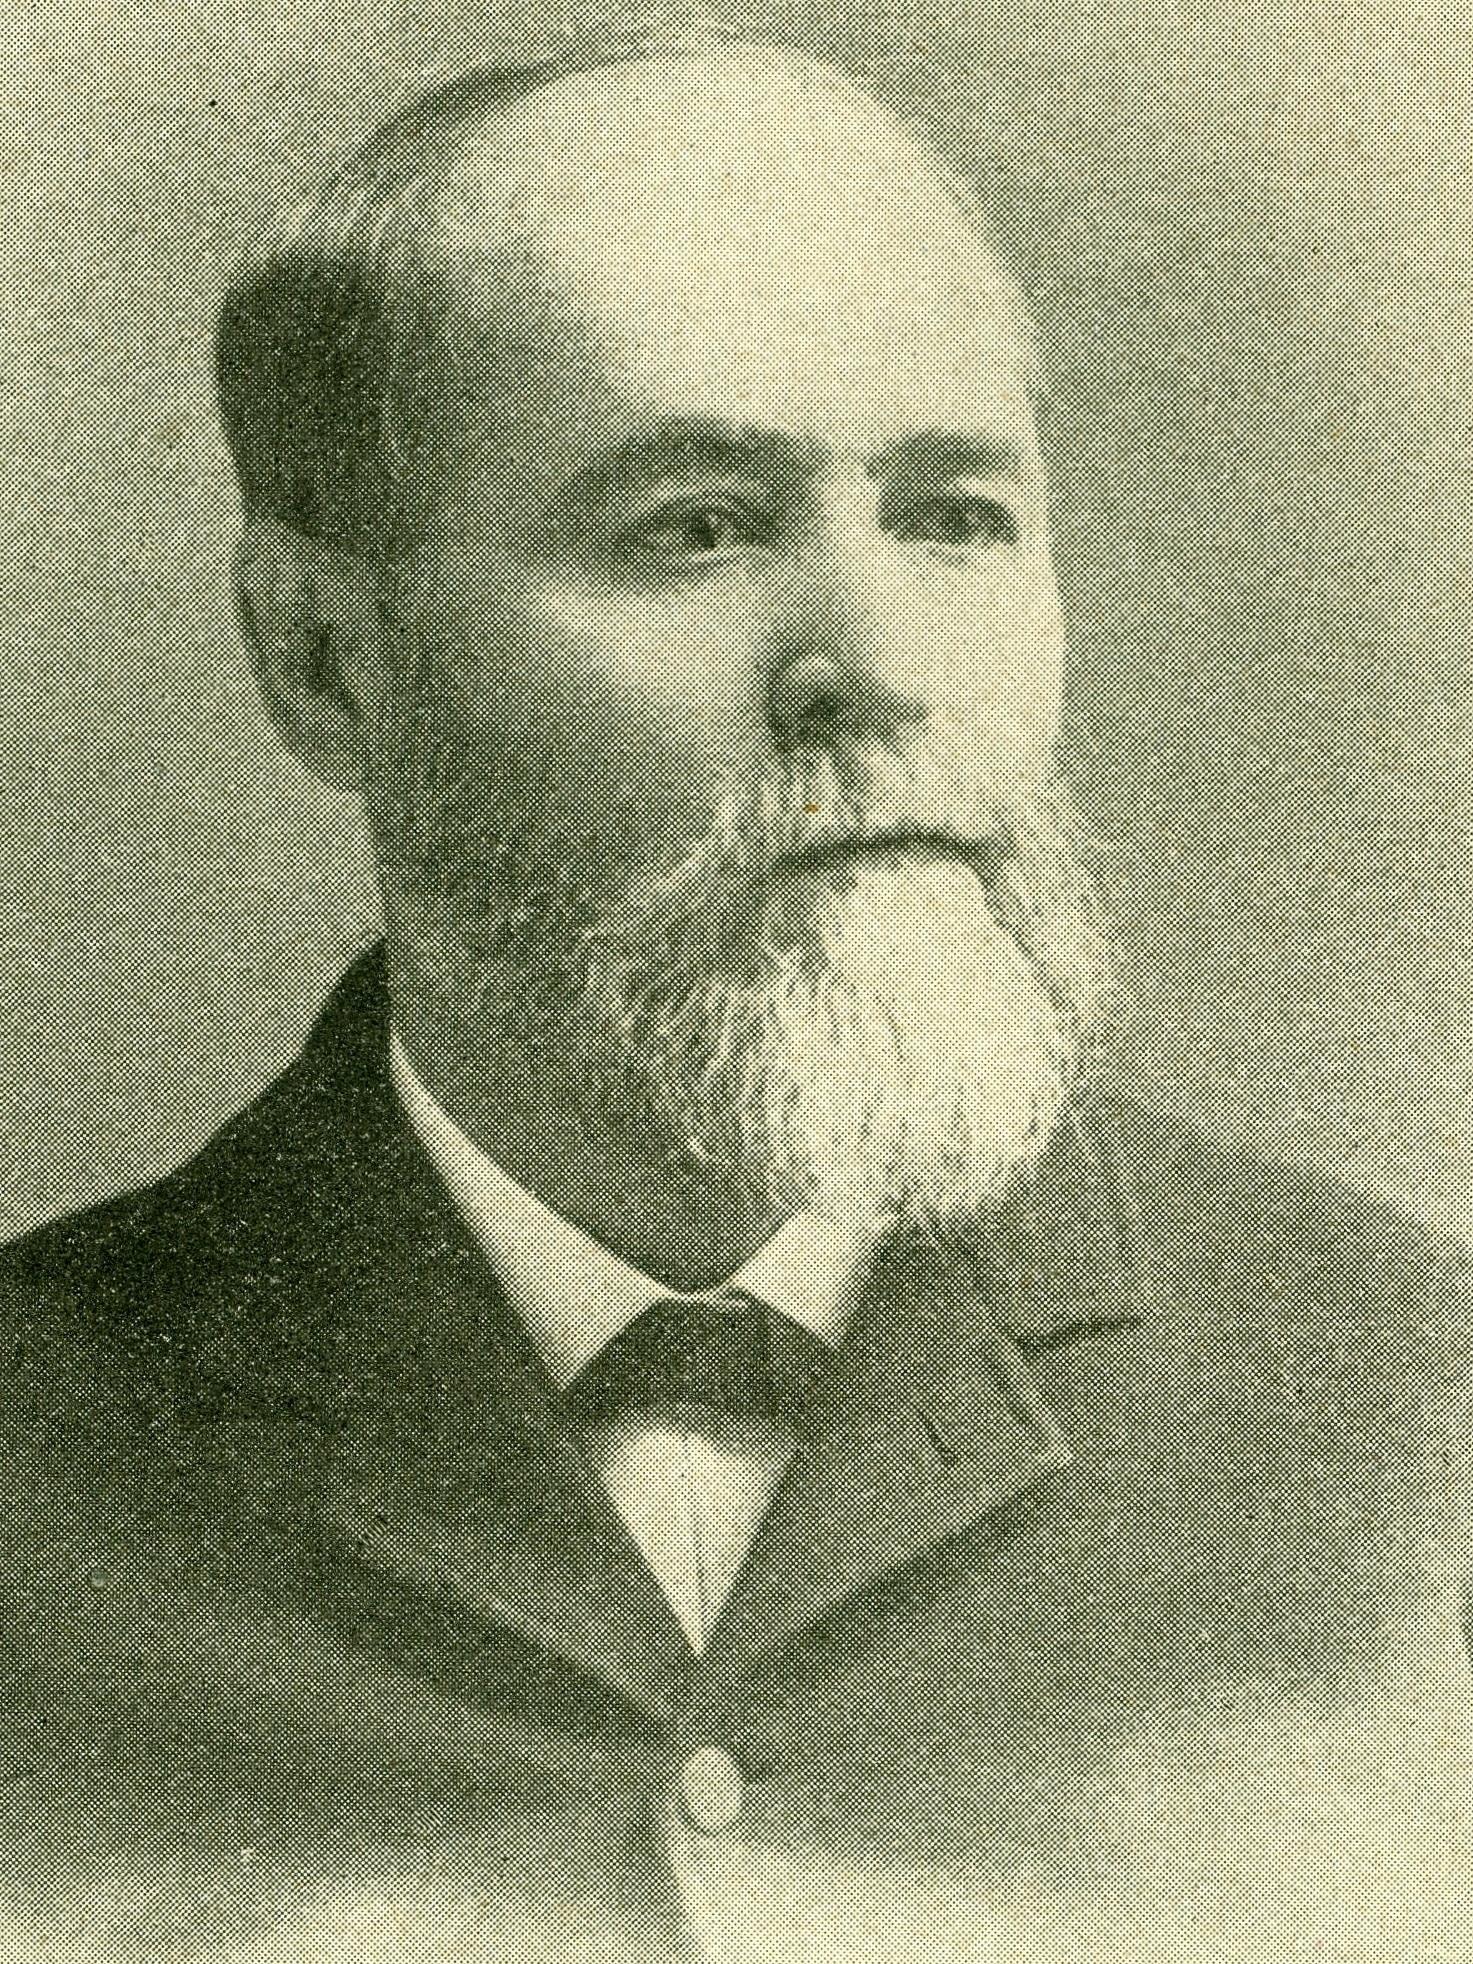 File:Richard P. Bland (10506992553) (1).jpg - Wikimedia Commons